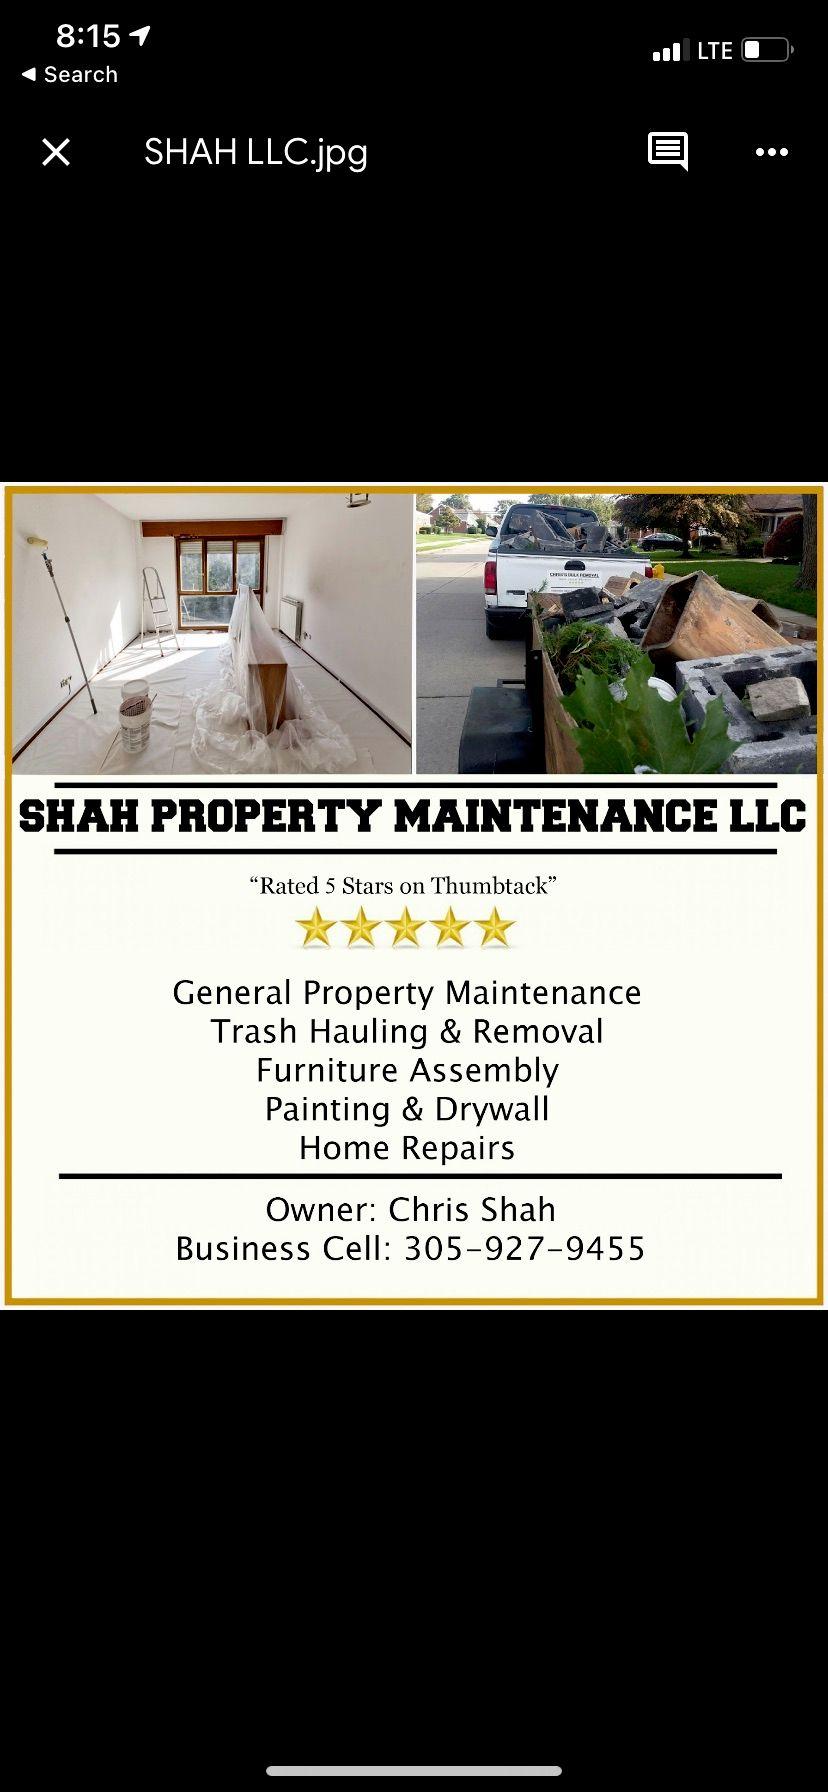 Shah Property Maintenance LLC